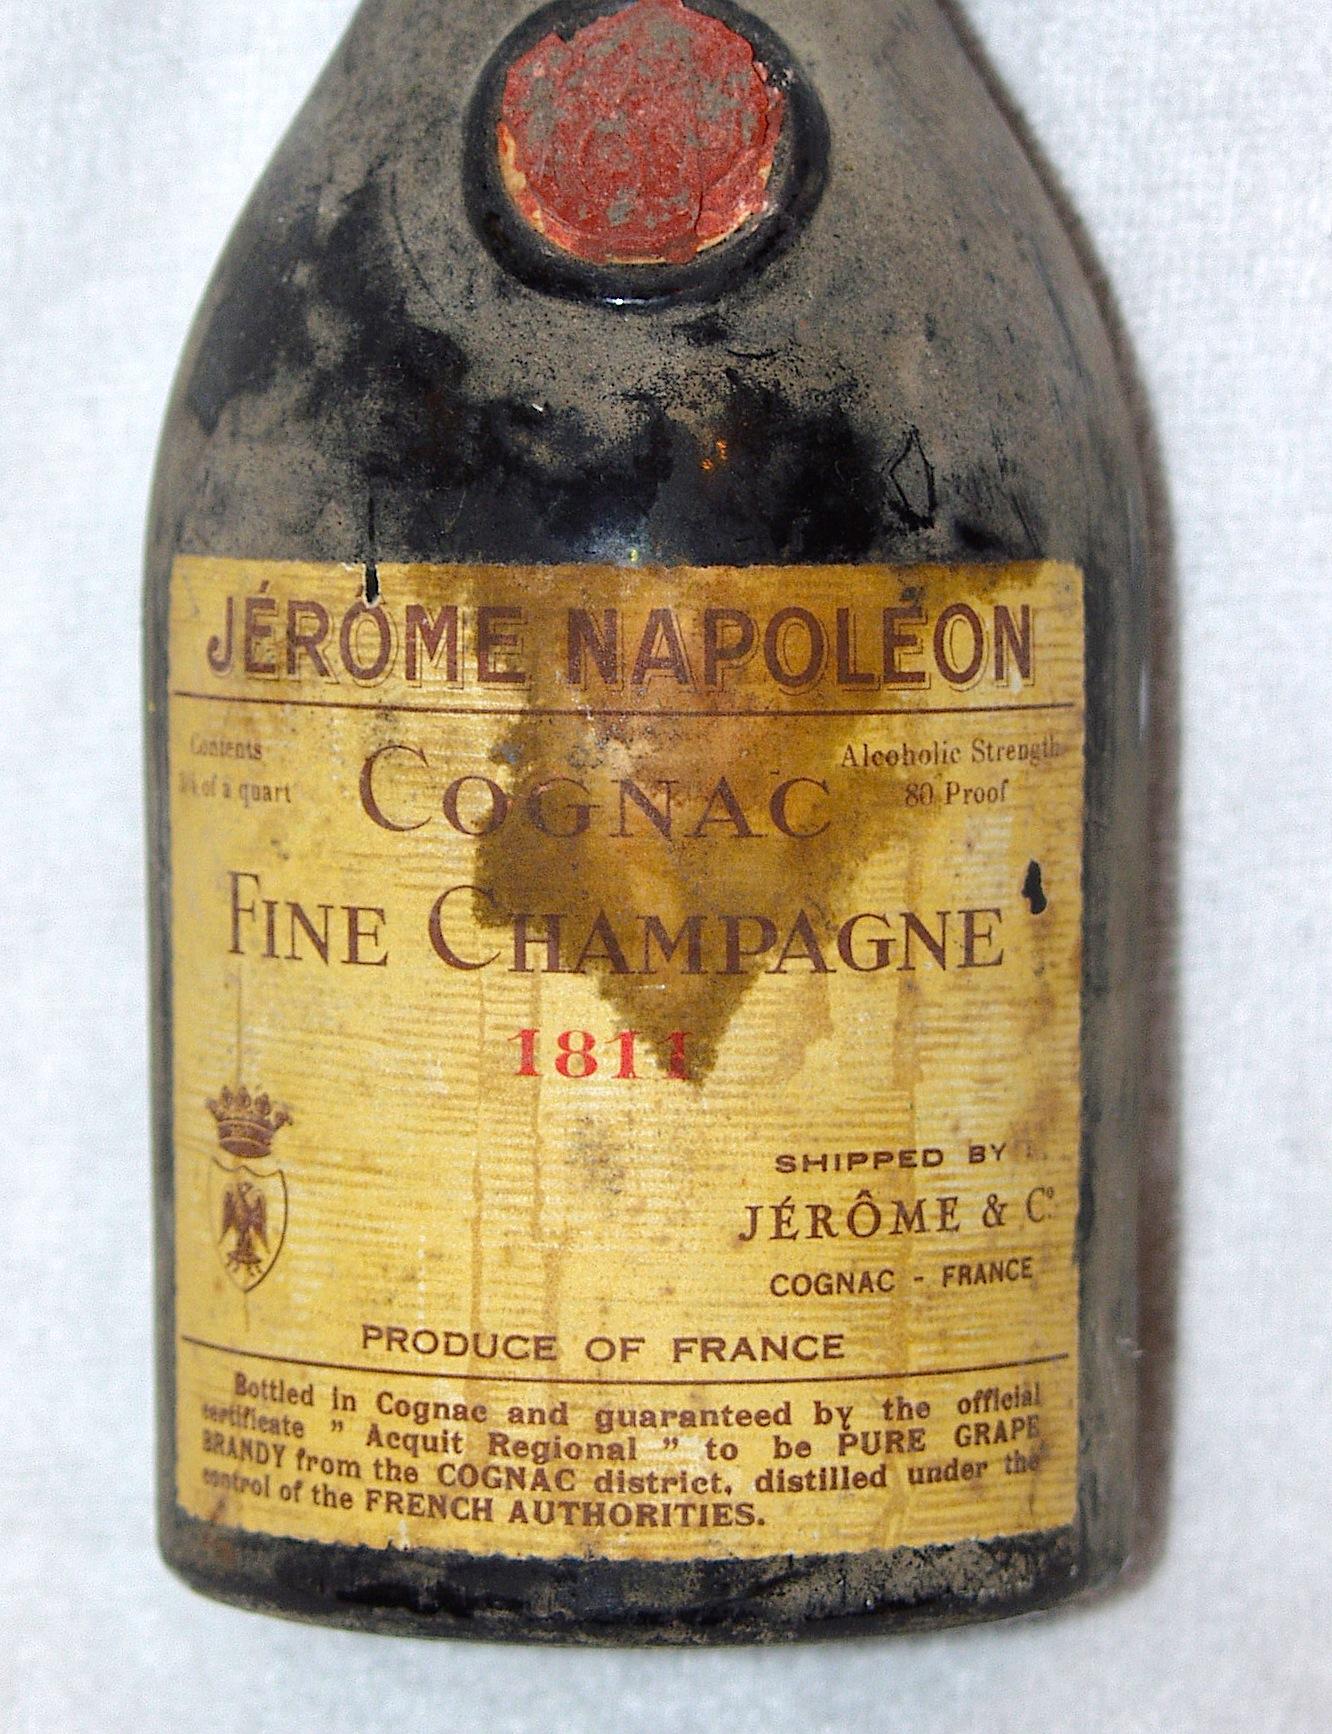 Jerome Napoleon